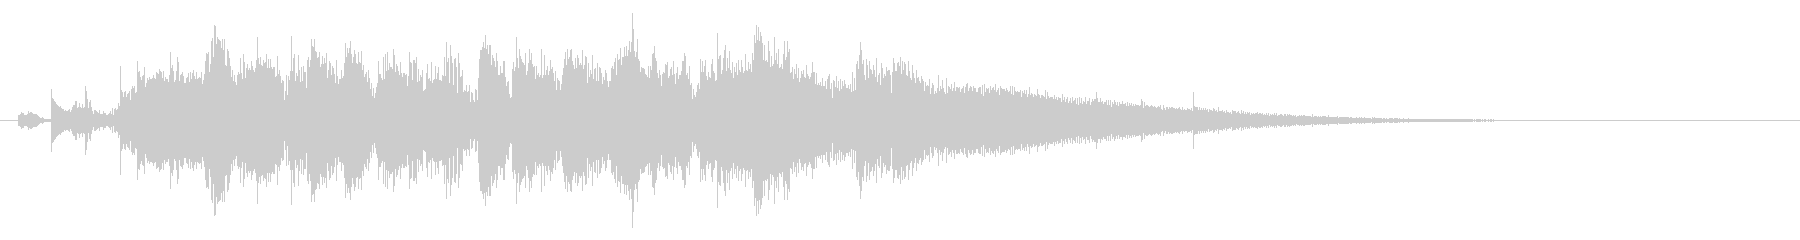 jazz風のピアノメインのジングルの未再生の波形